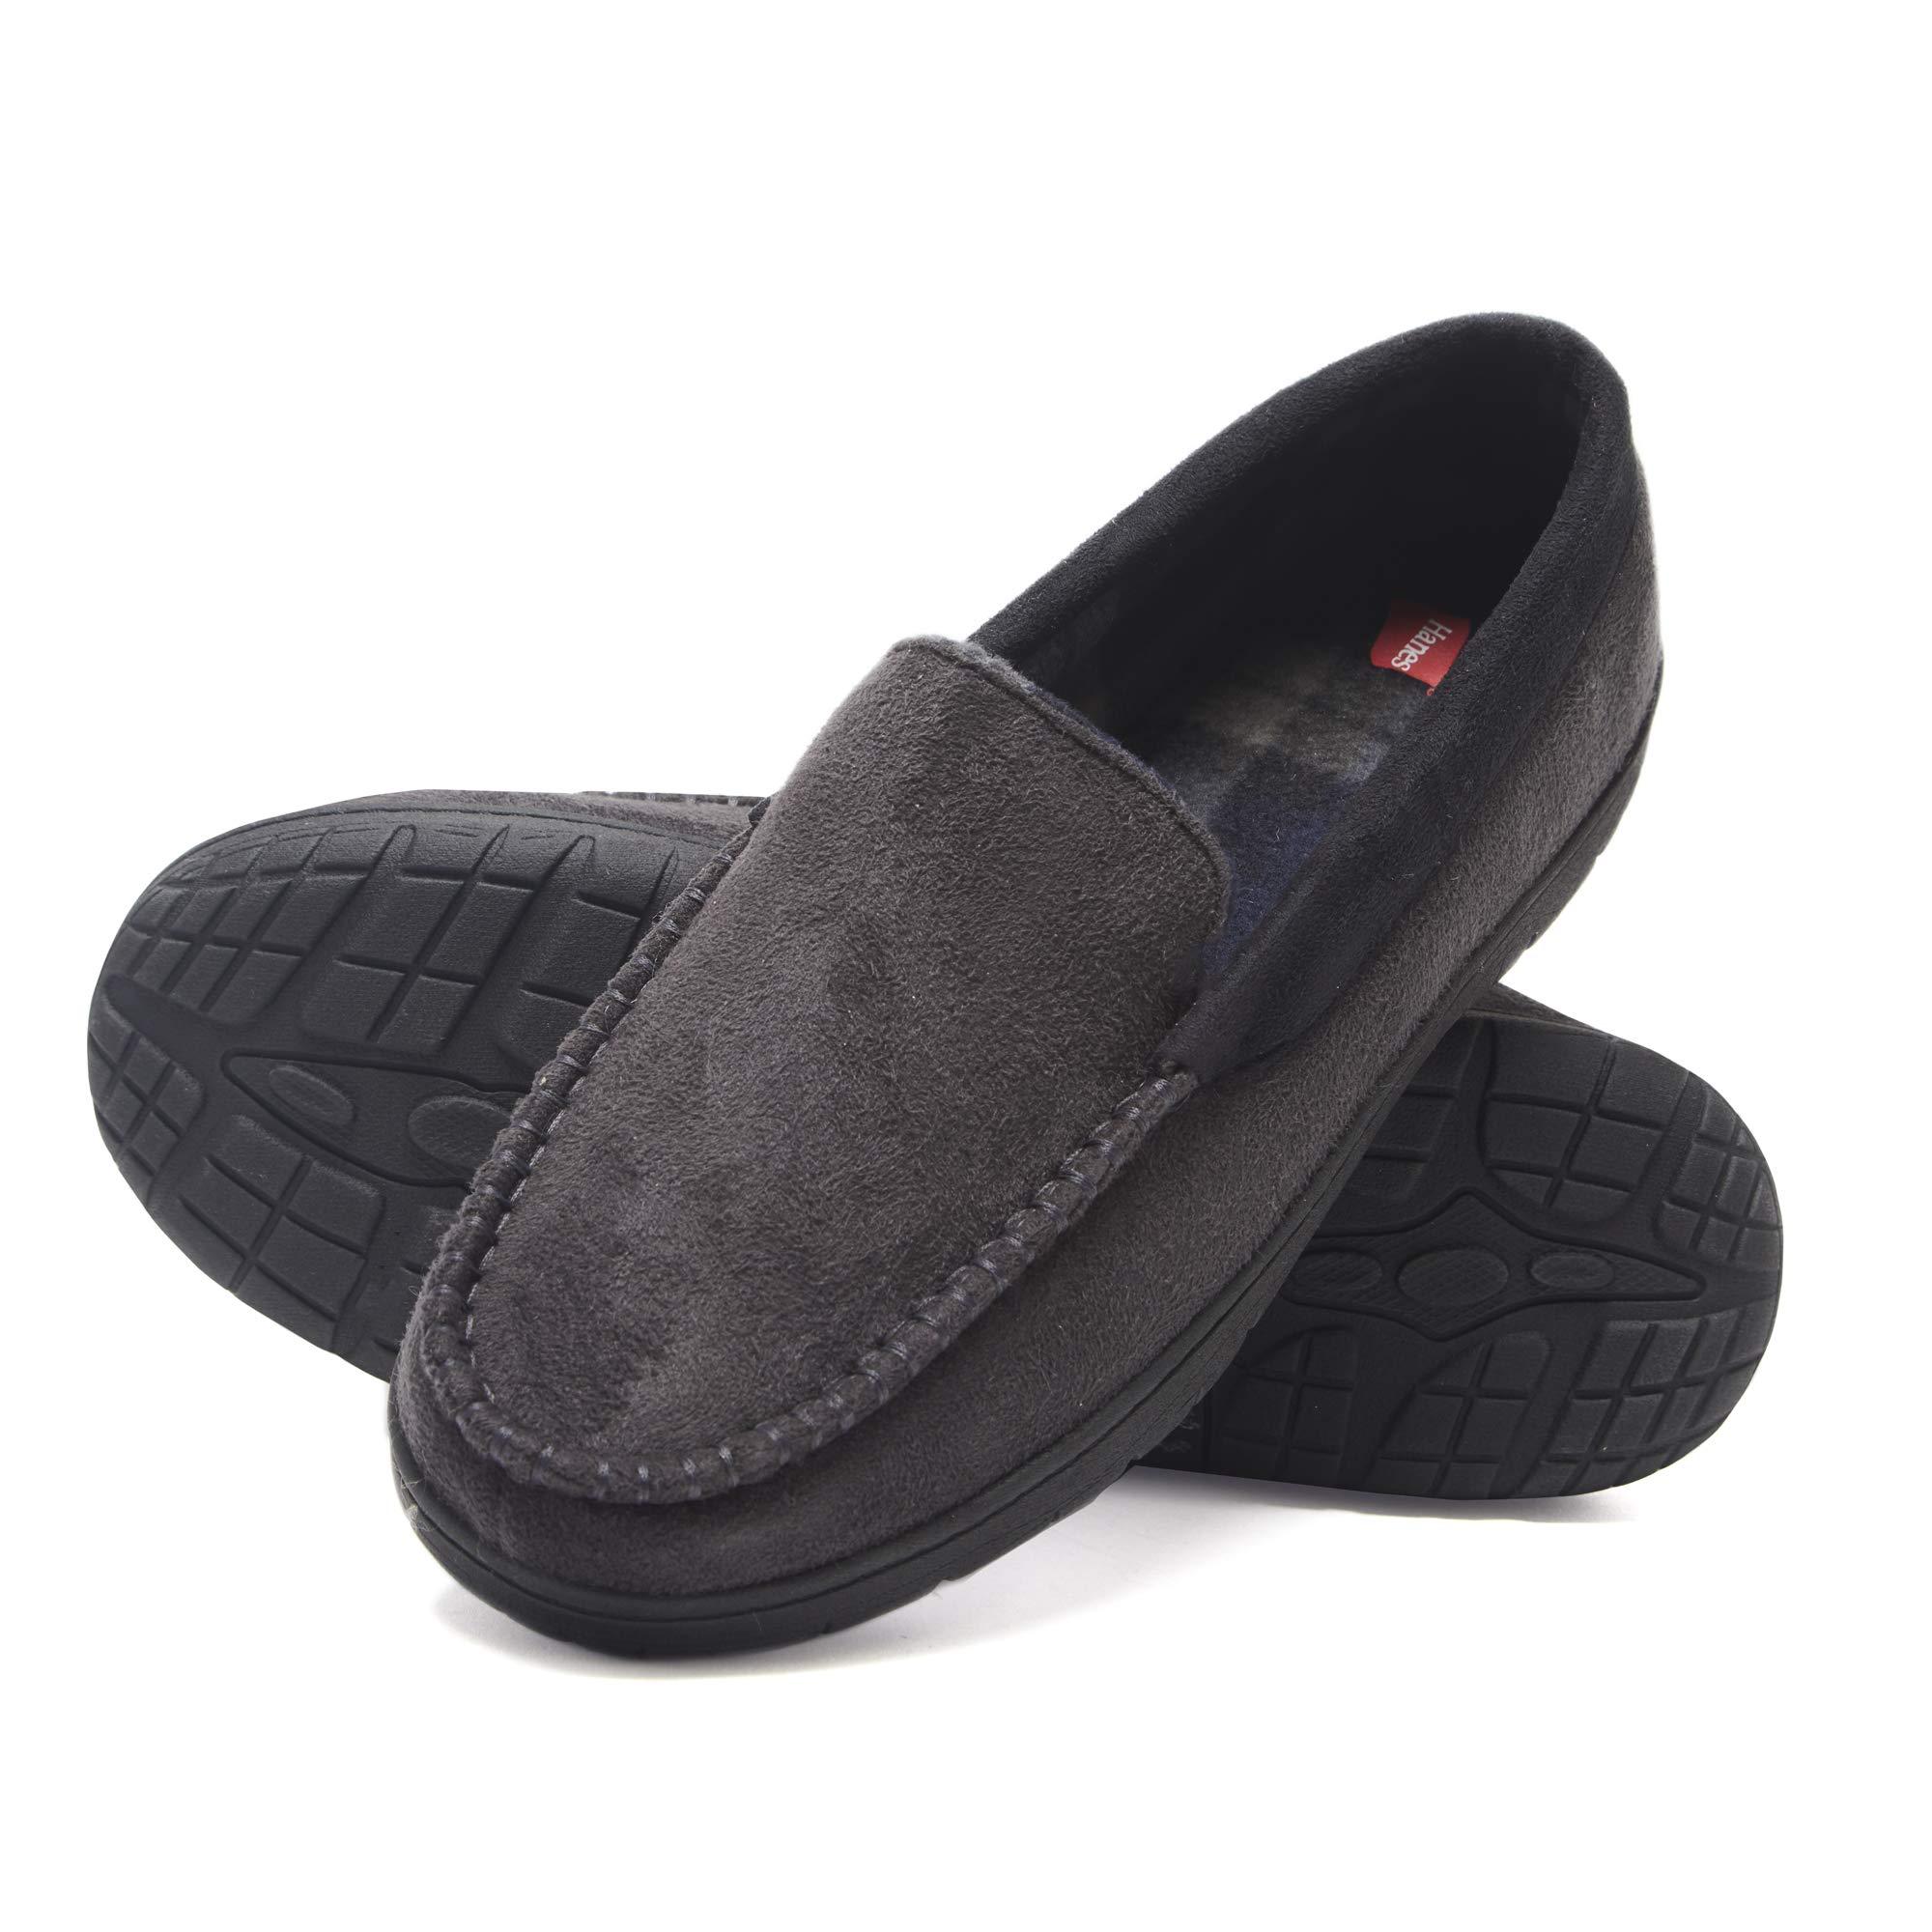 Hanes Mens Slippers House Shoes Moccasin Comfort Memory Foam Indoor Outdoor Fresh IQ